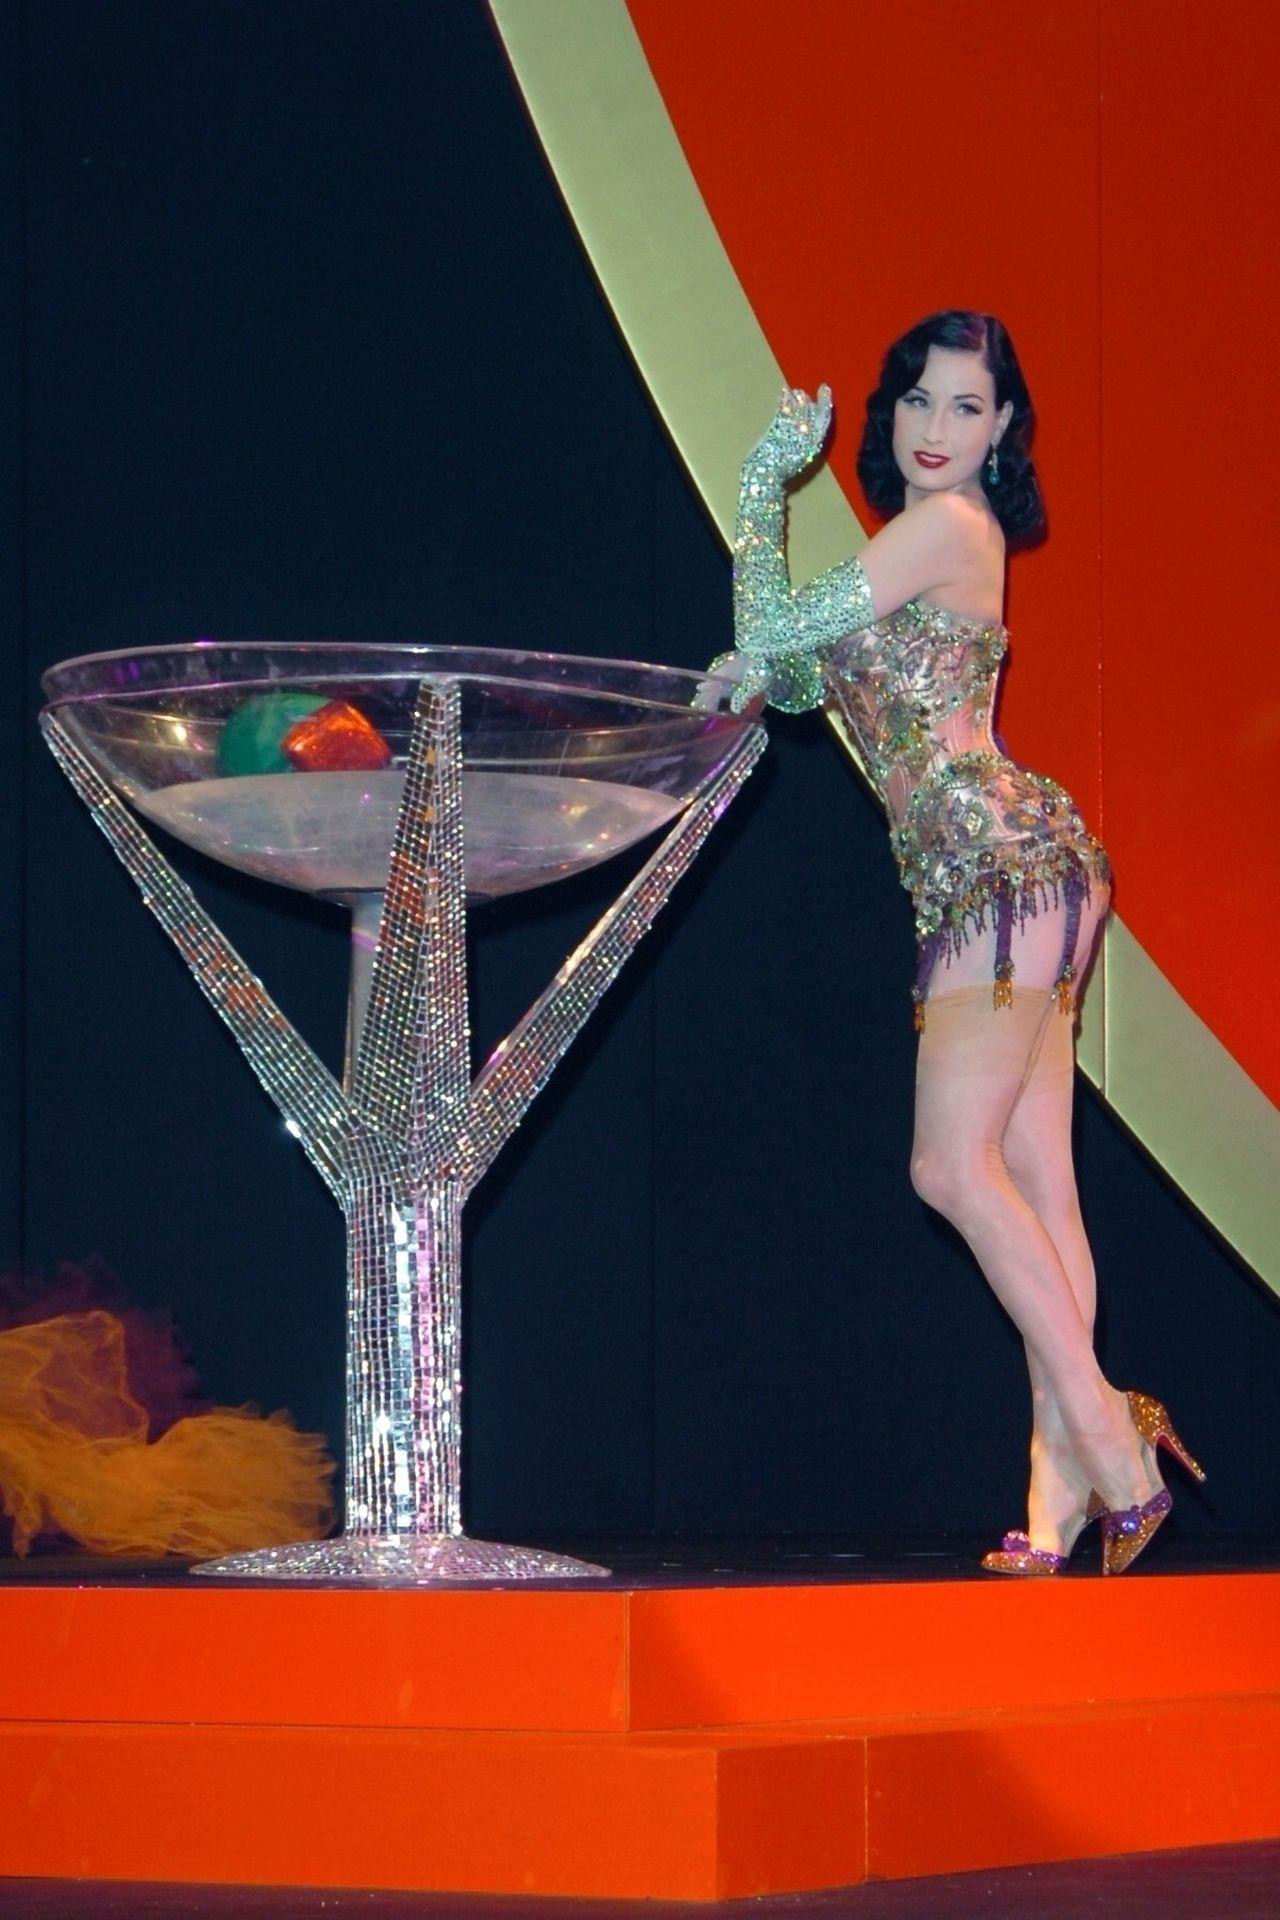 Dita Von Teese Performs At Erotica 06 In London 0014